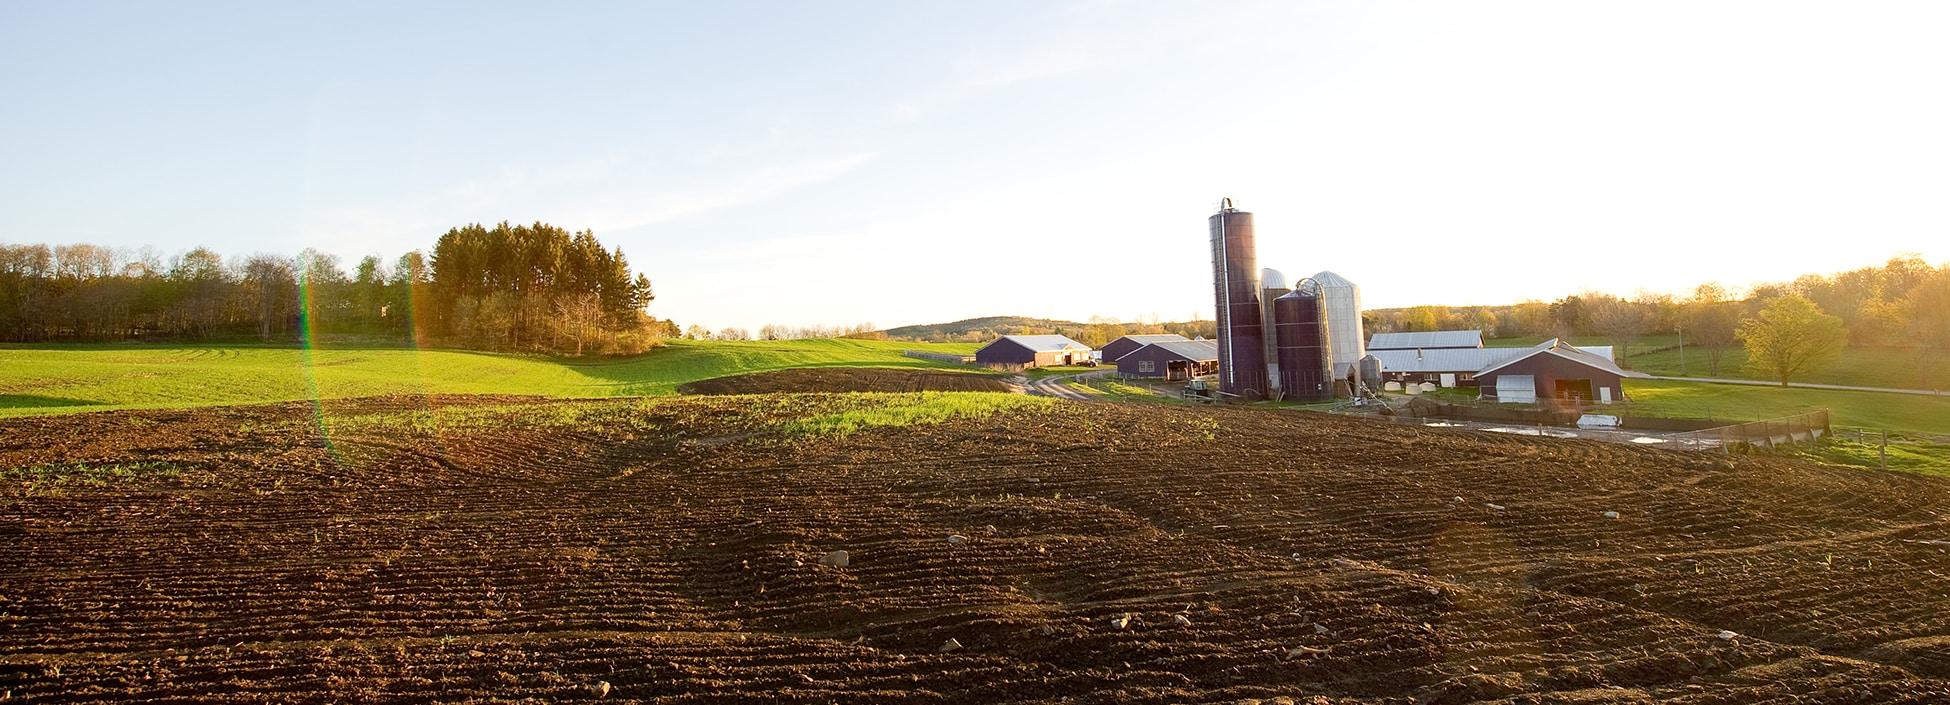 vermont tech farm